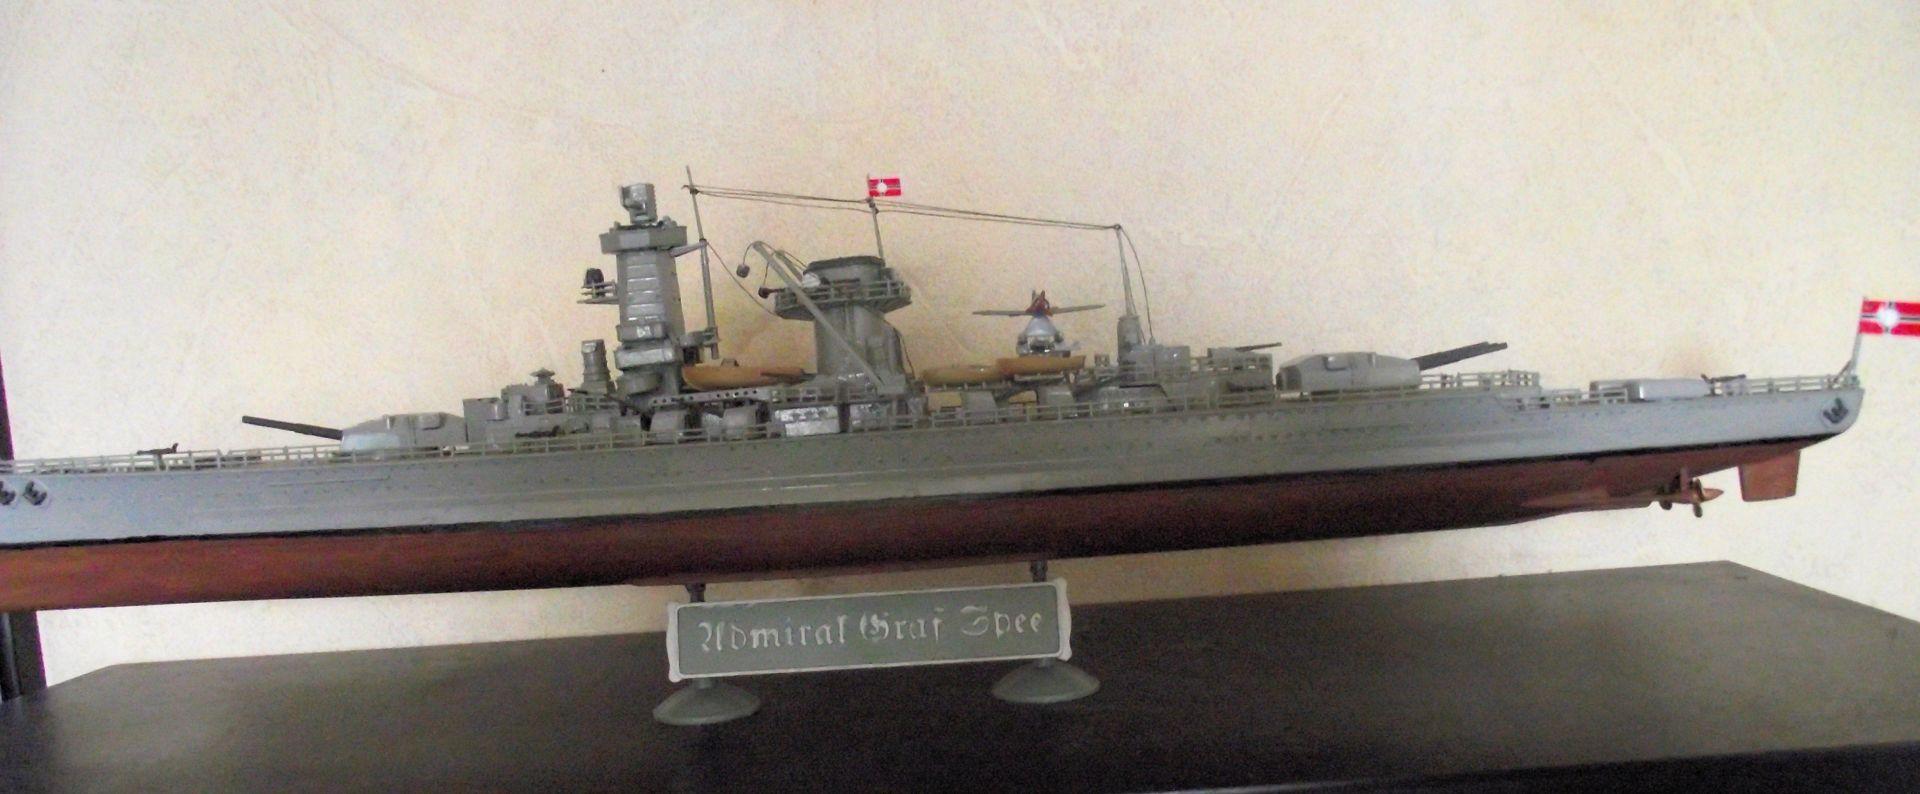 Admiral Graf Spee 1/350 Academy  422179MaquetteGrafSpee1x3501